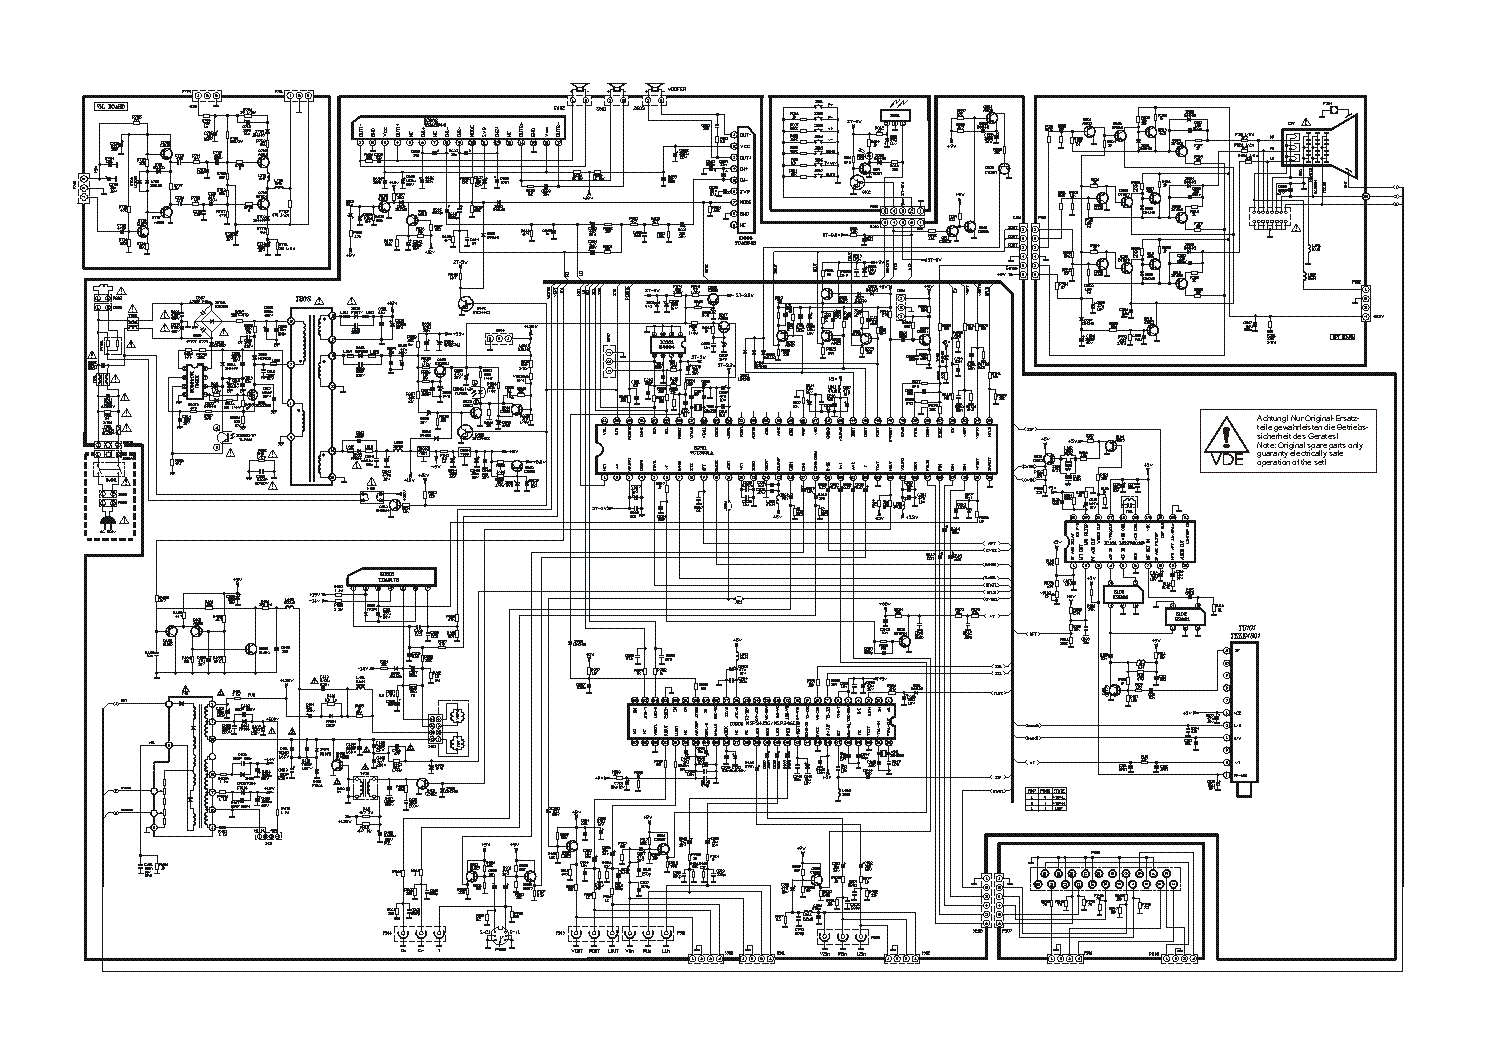 Tcl 9621b 02-267180-100